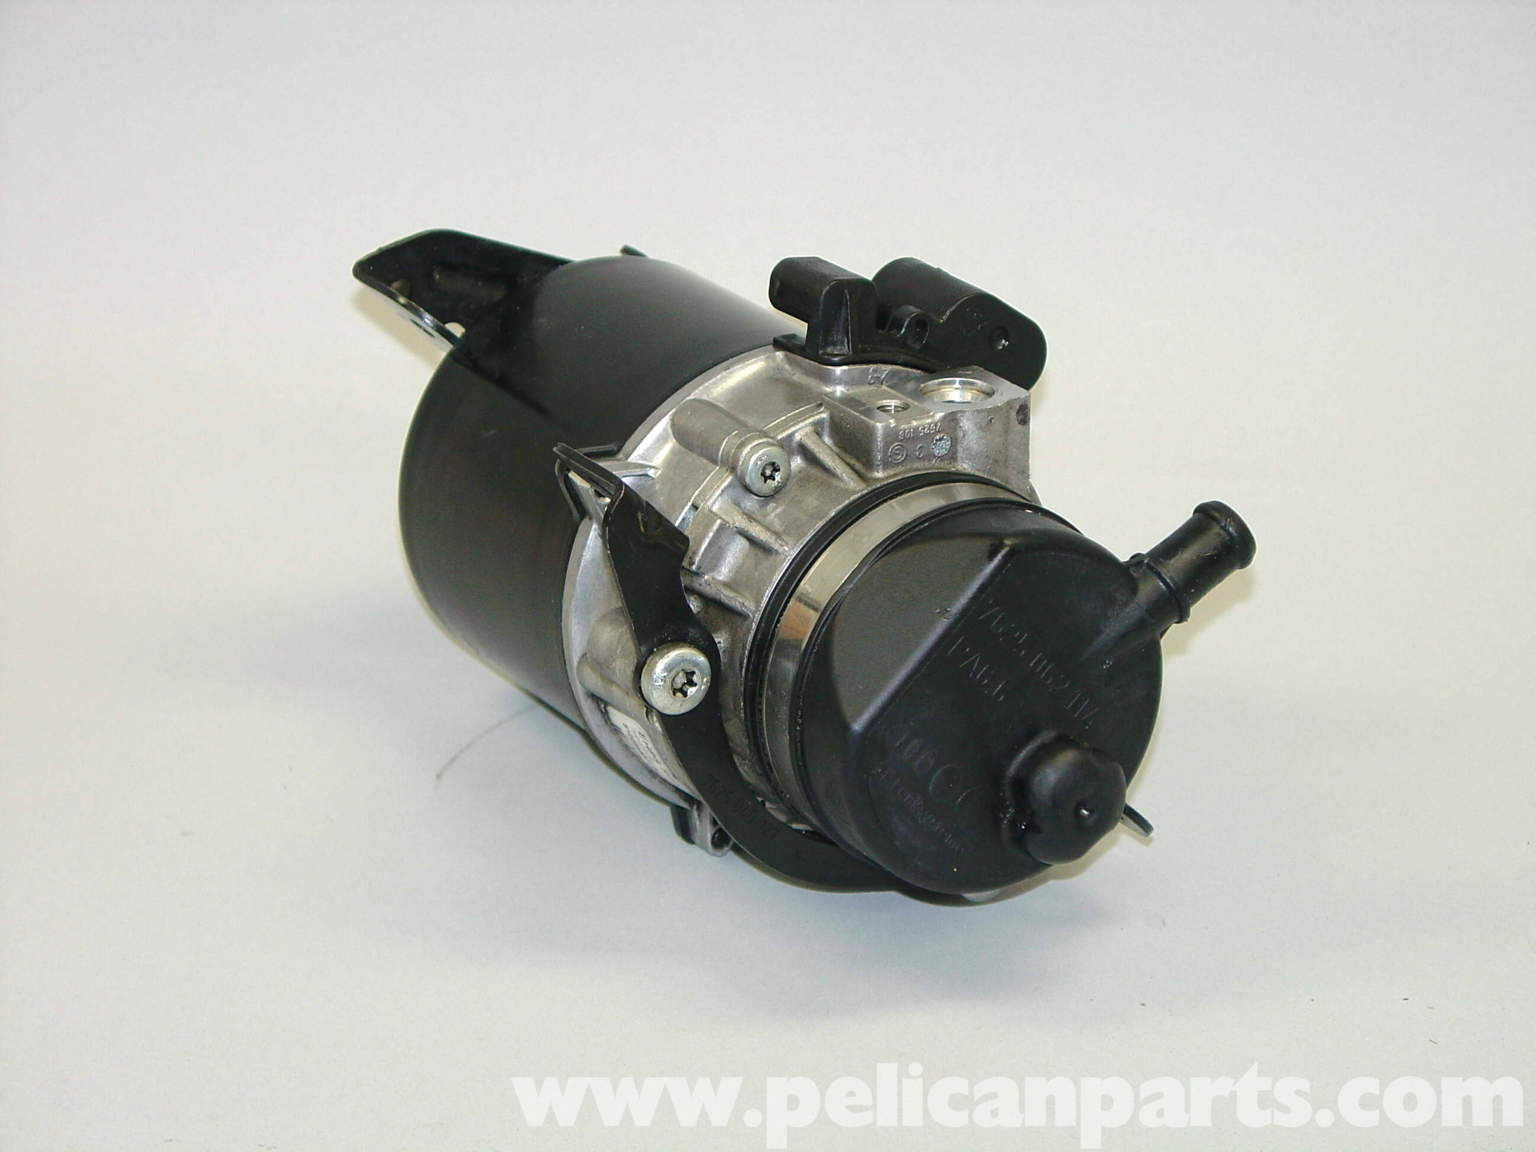 Mini Cooper Power Steering Pump Replacement R50 R52 R53